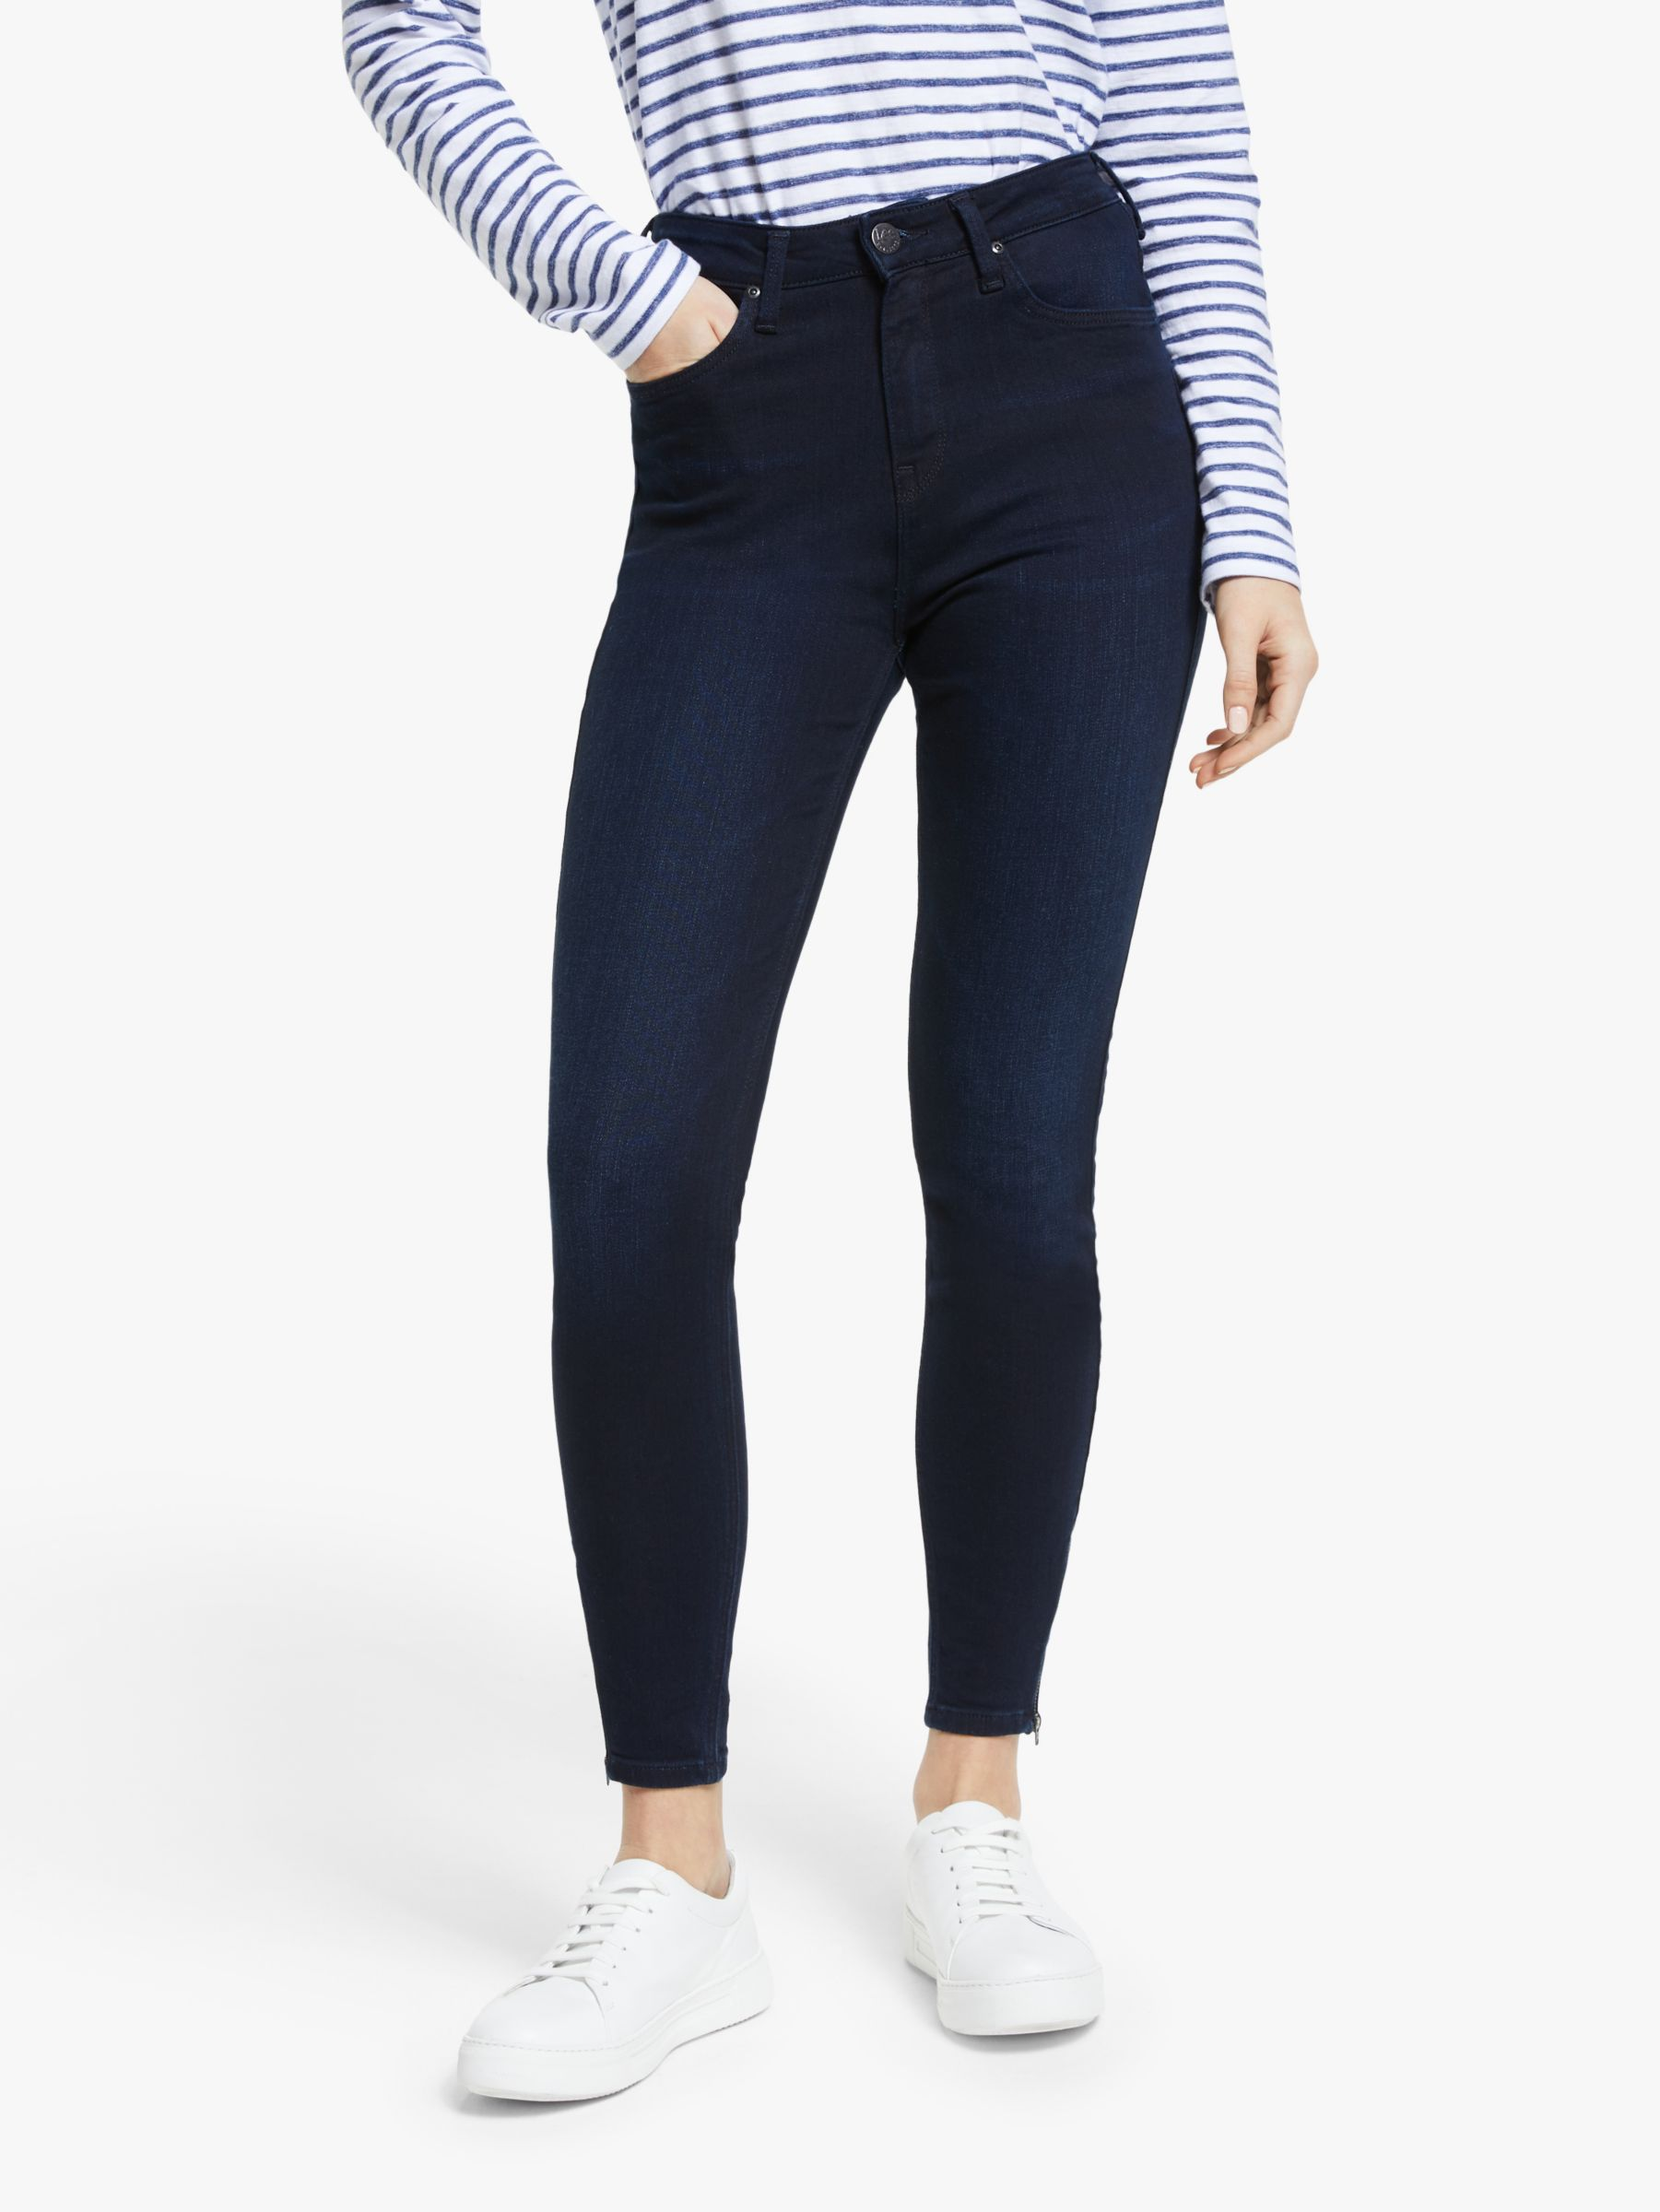 Lee Lee Scarlett High Waist Skinny Jeans, Mulberry